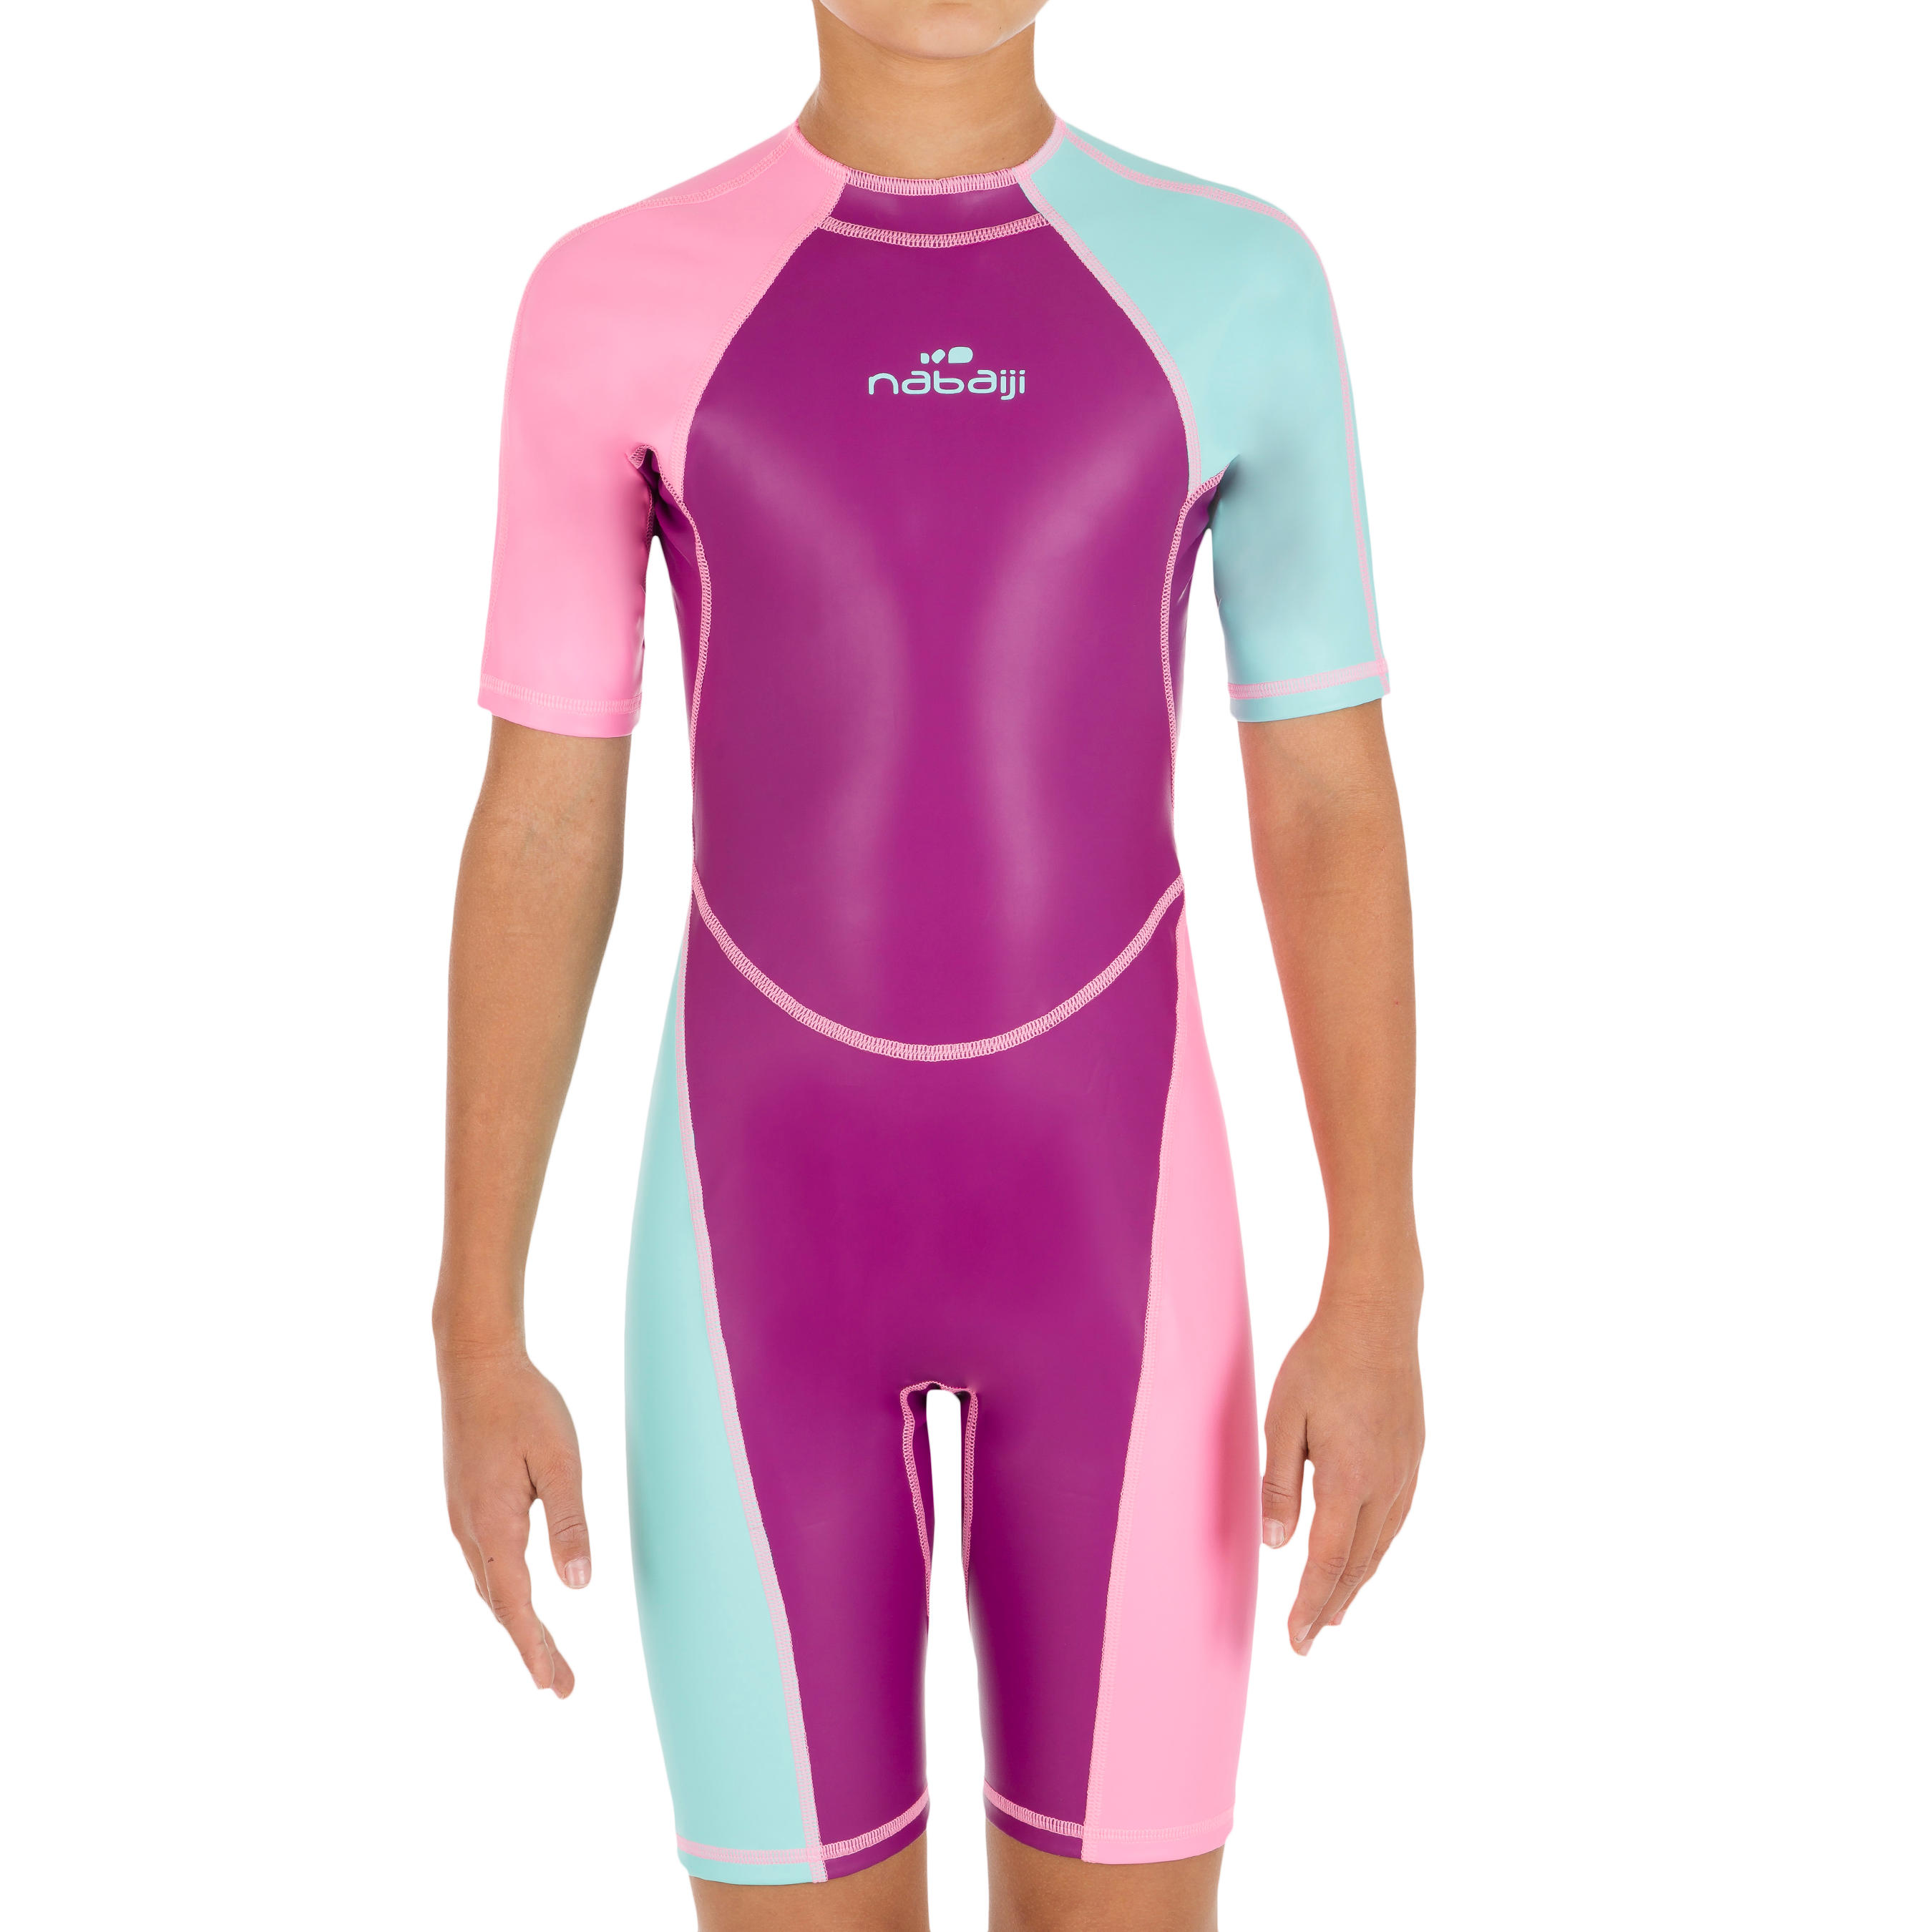 Kloupi Girls' Swim Shorty - Purple Pink